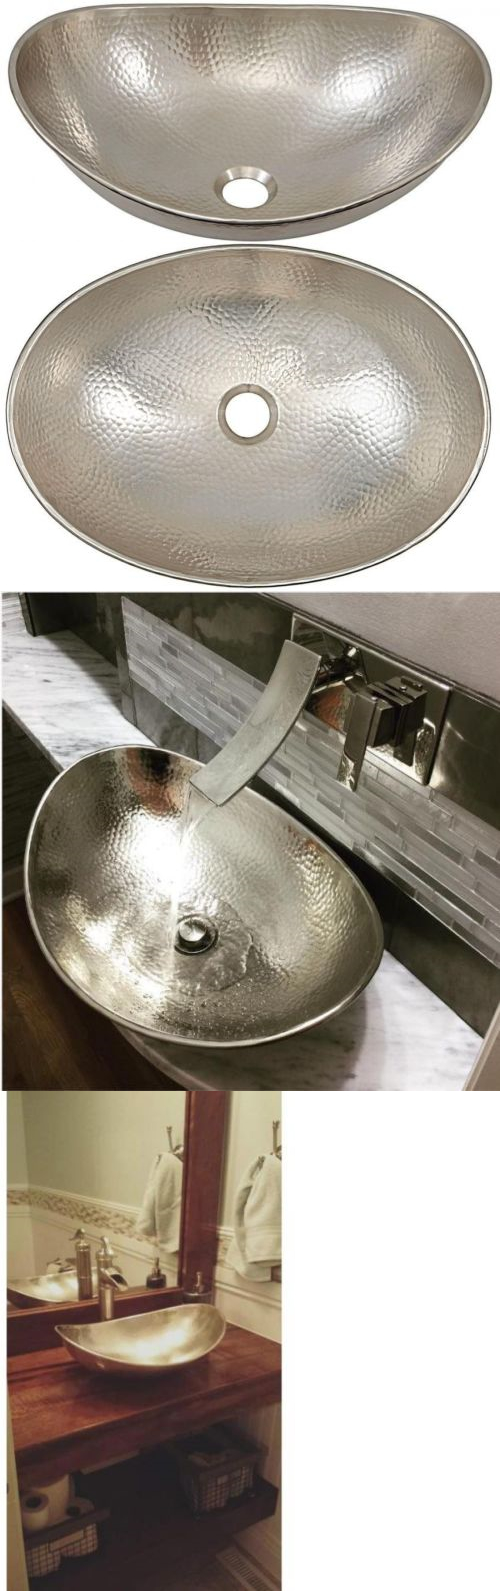 Sks 71283 Bathroom Vessel Sk Above Counter Handcrafted Copper